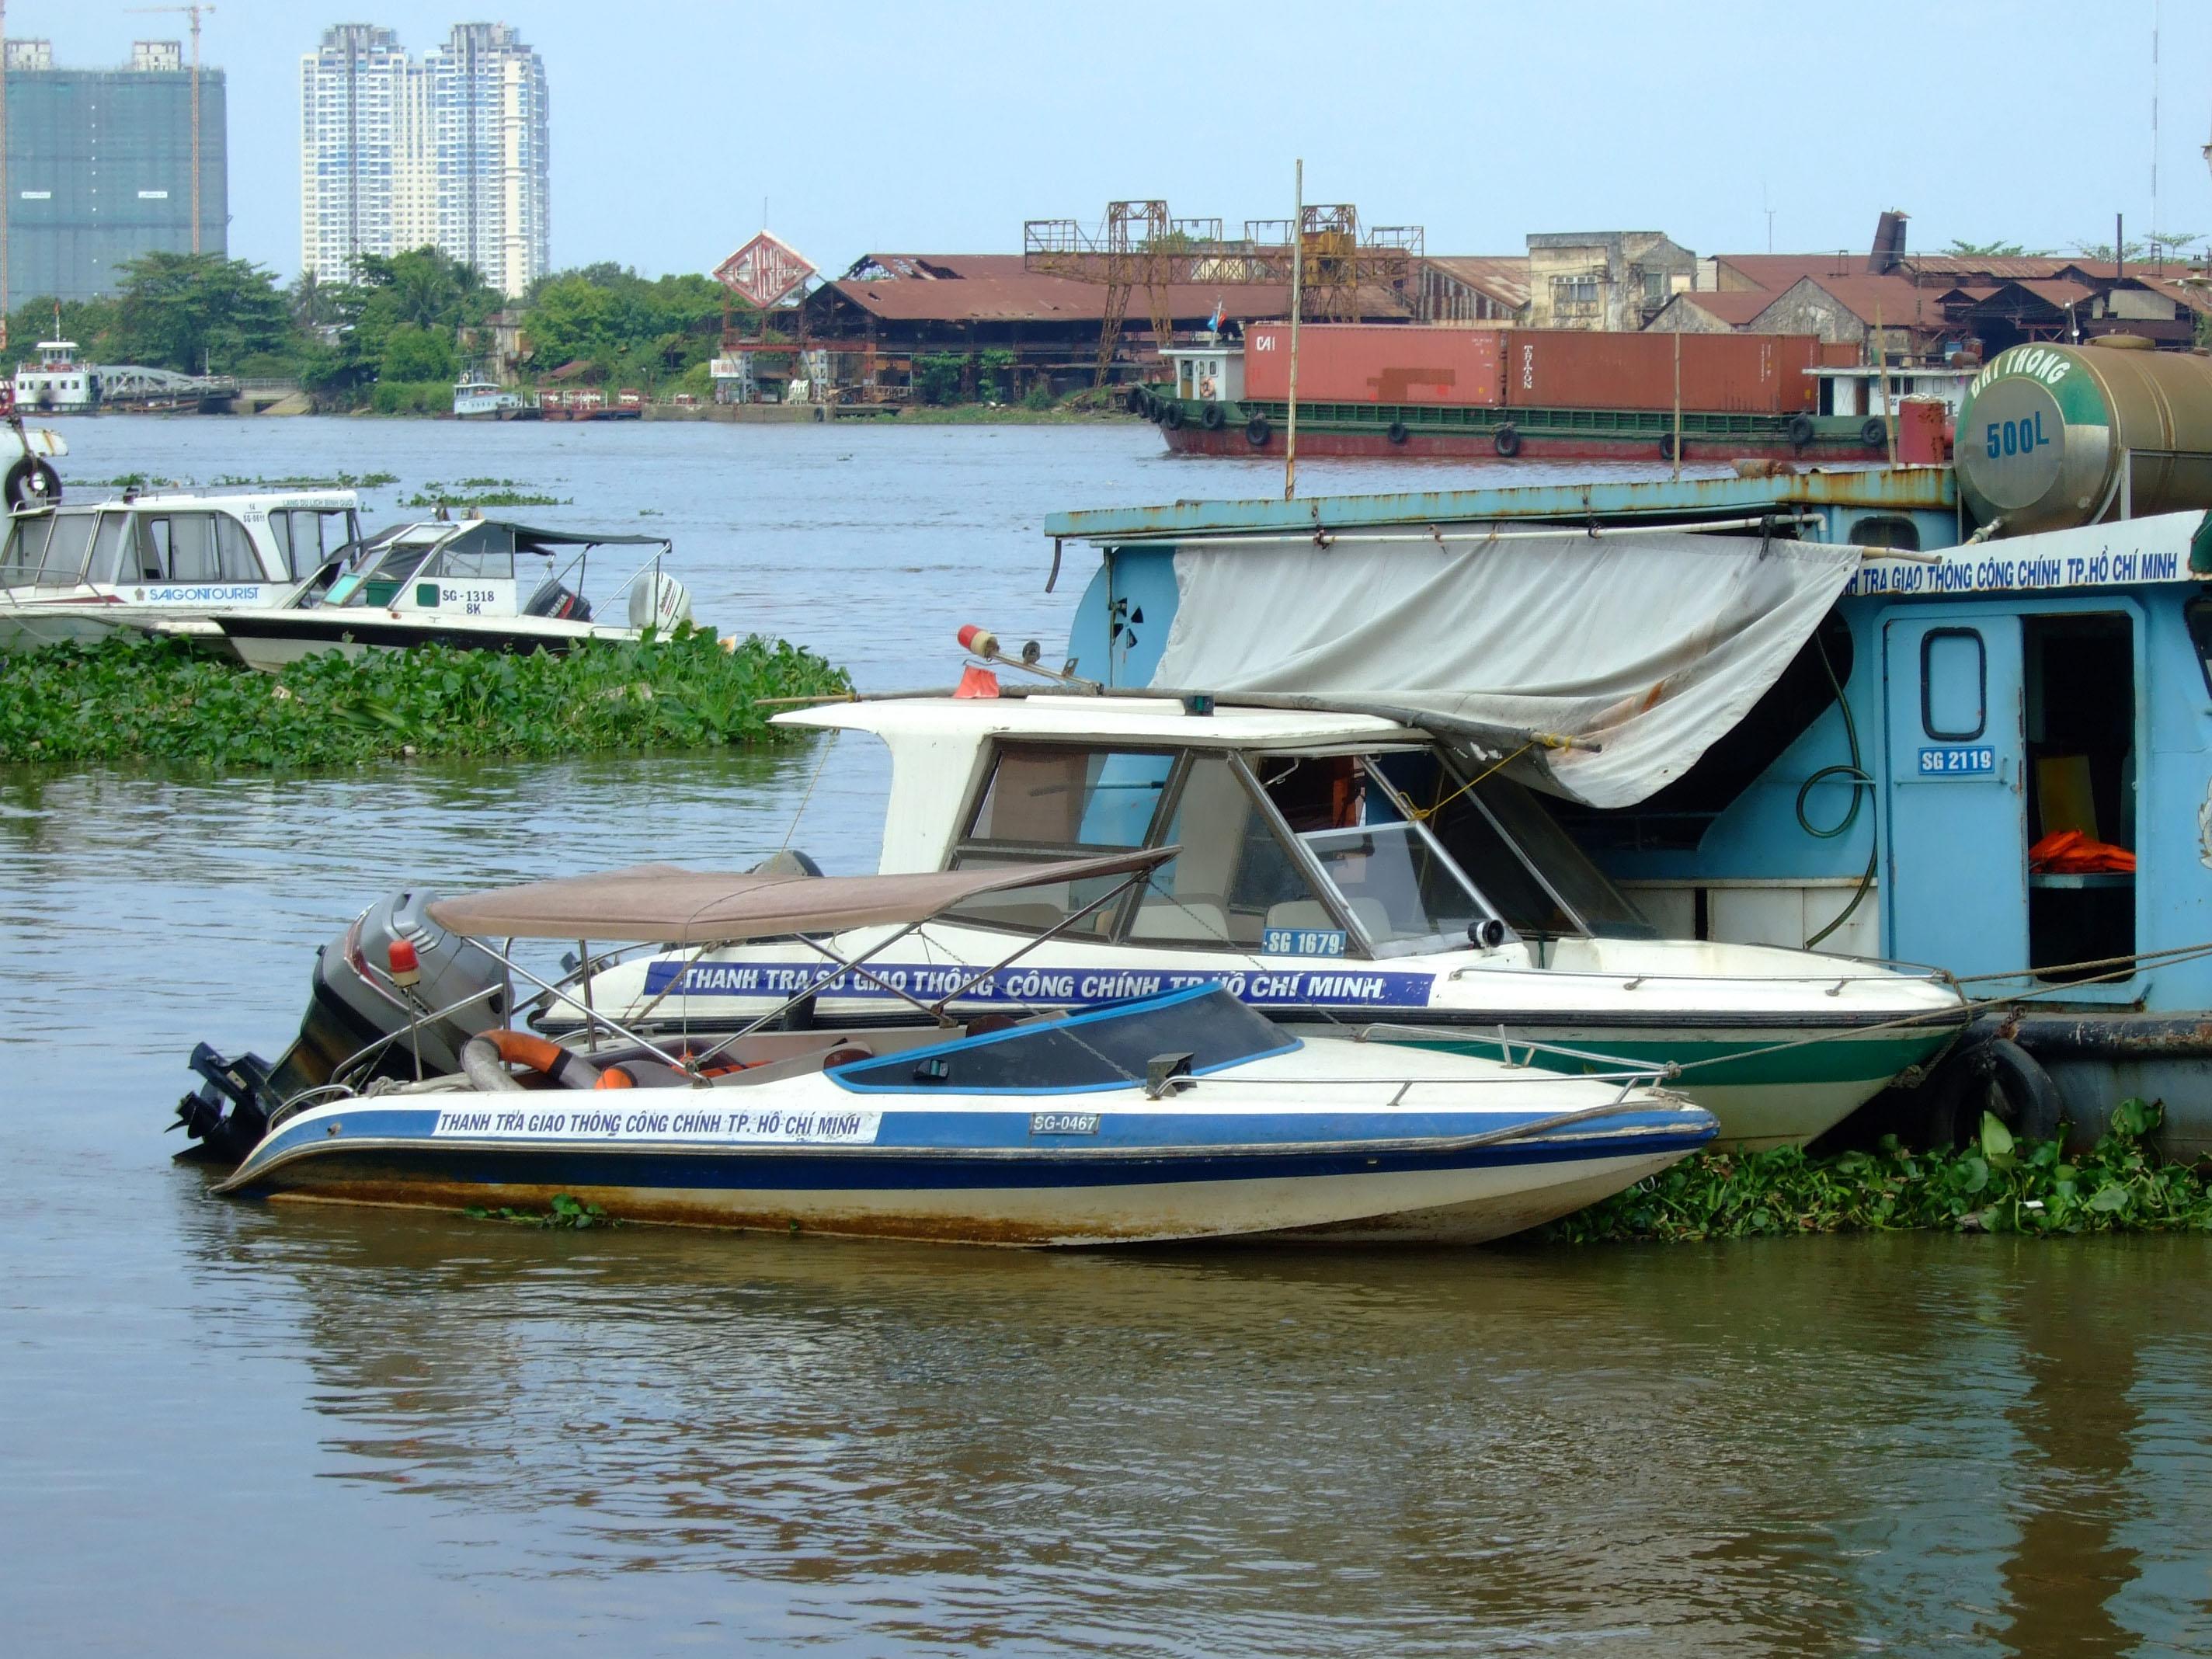 Vietnam Ho Chi Minh City Saigon harbor Ferries boats Feb 2009 28